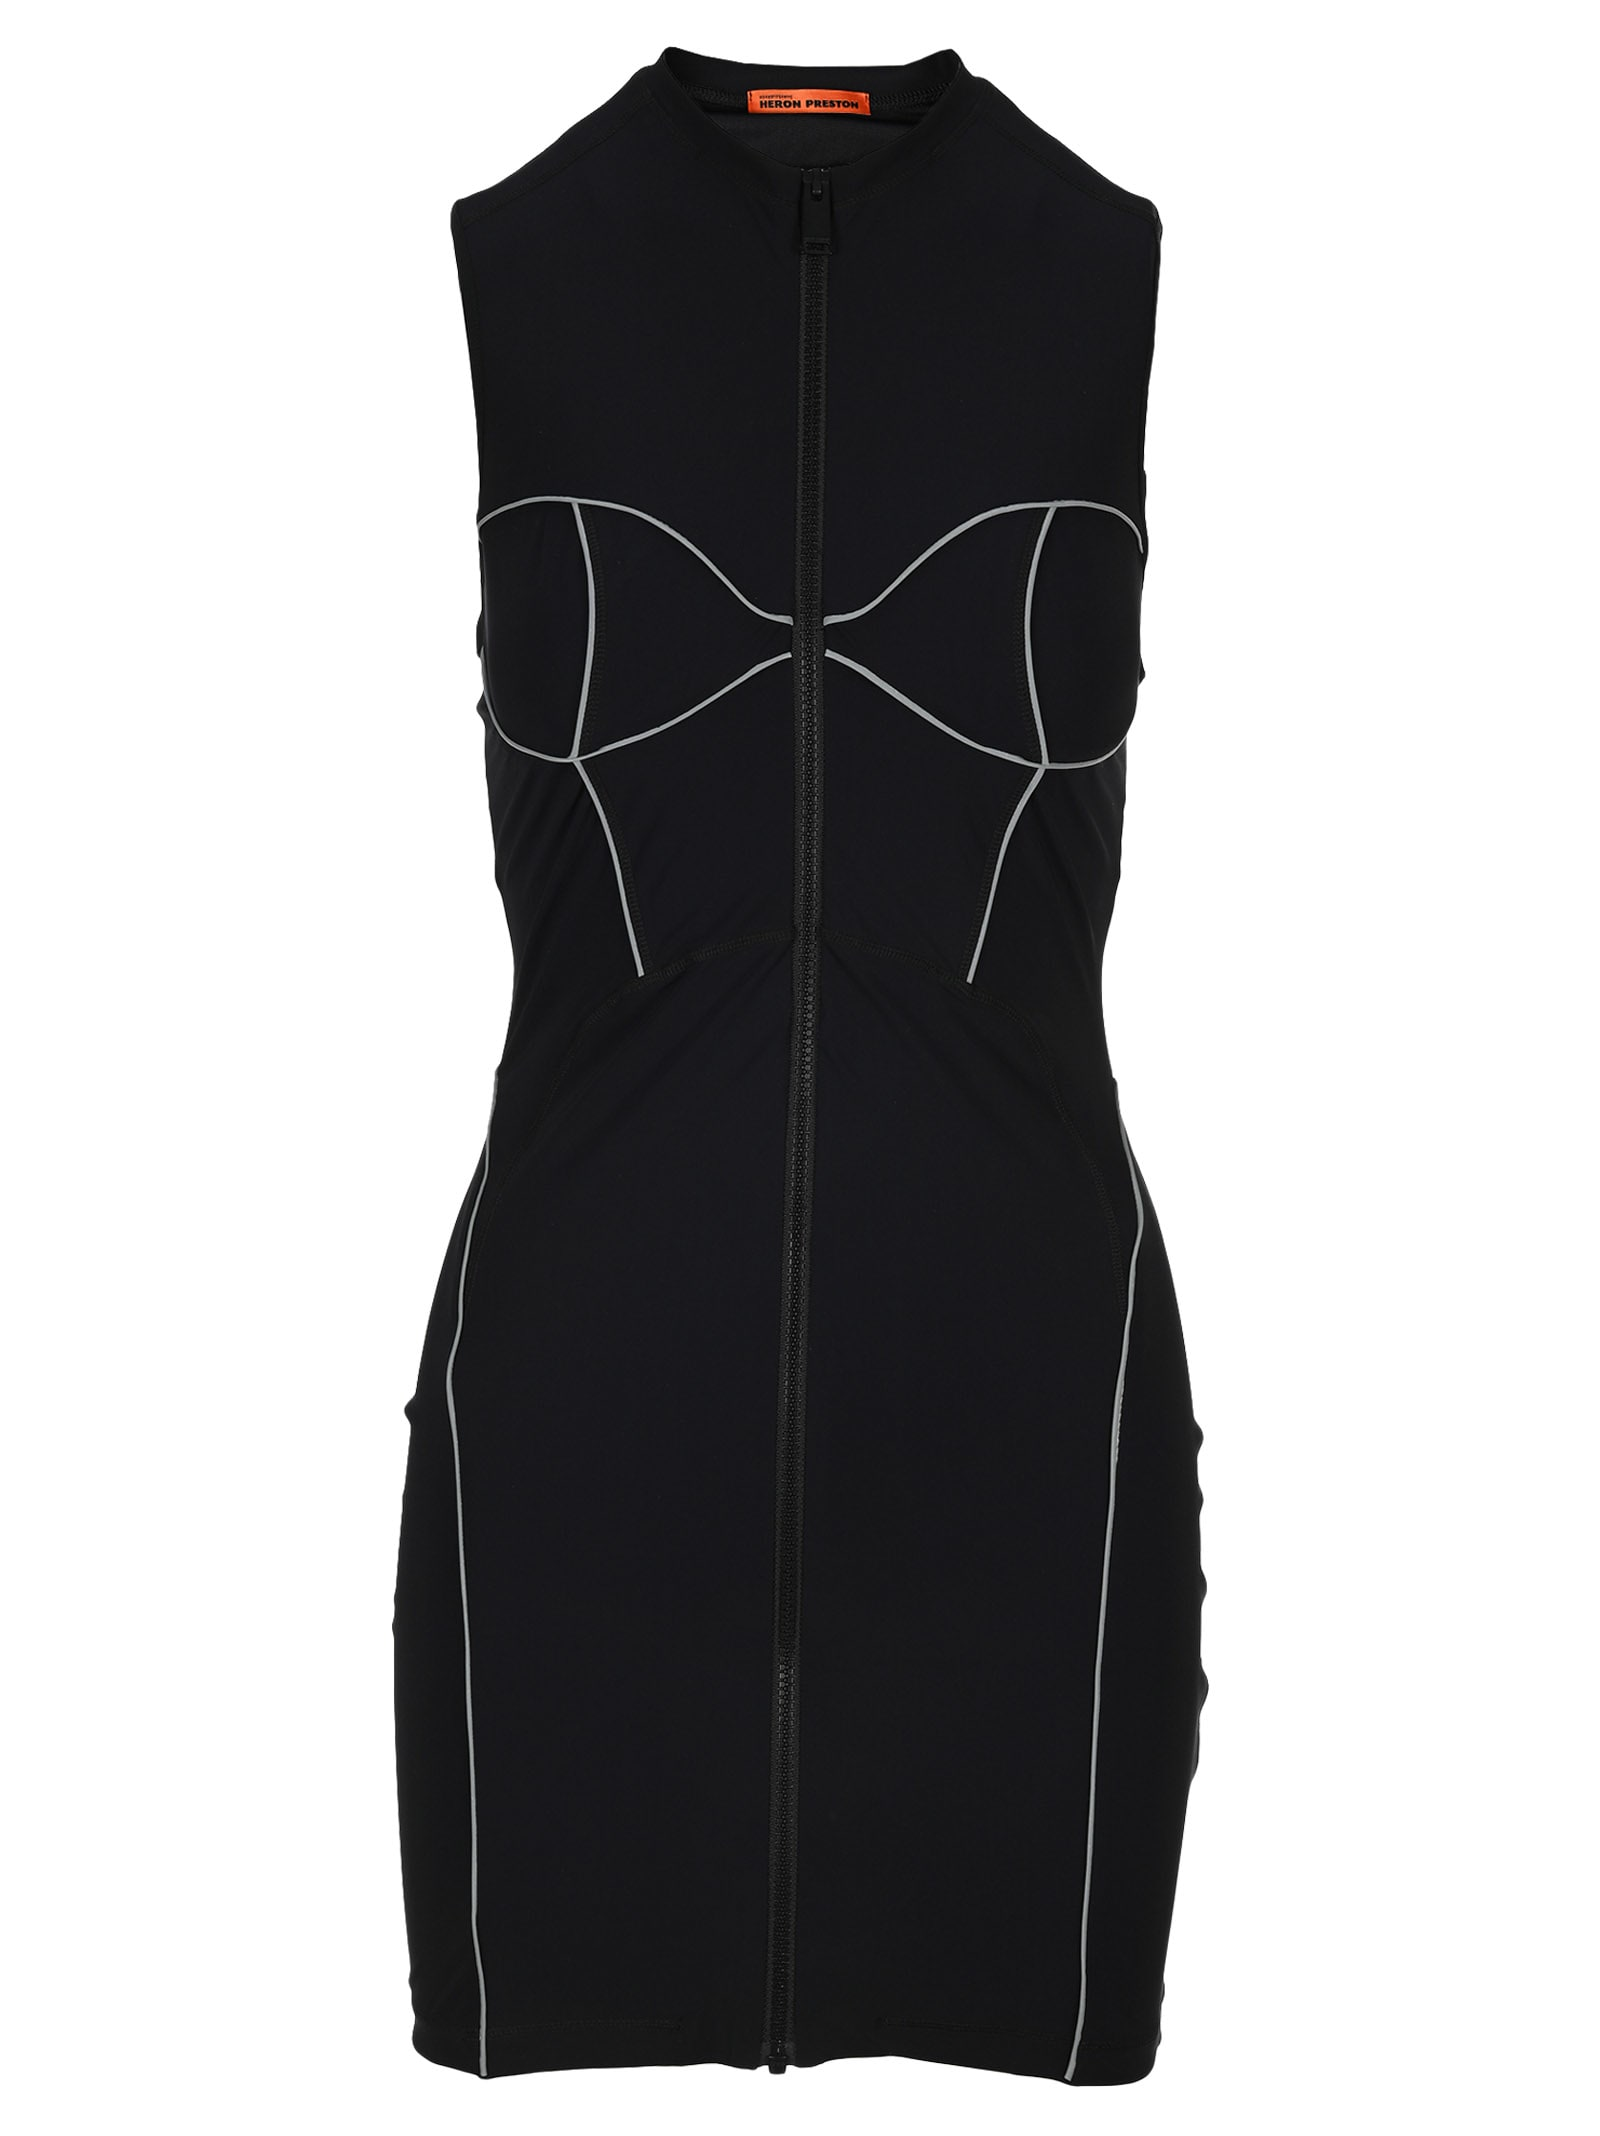 Buy HERON PRESTON Heron Preston Active Mini Dress online, shop HERON PRESTON with free shipping